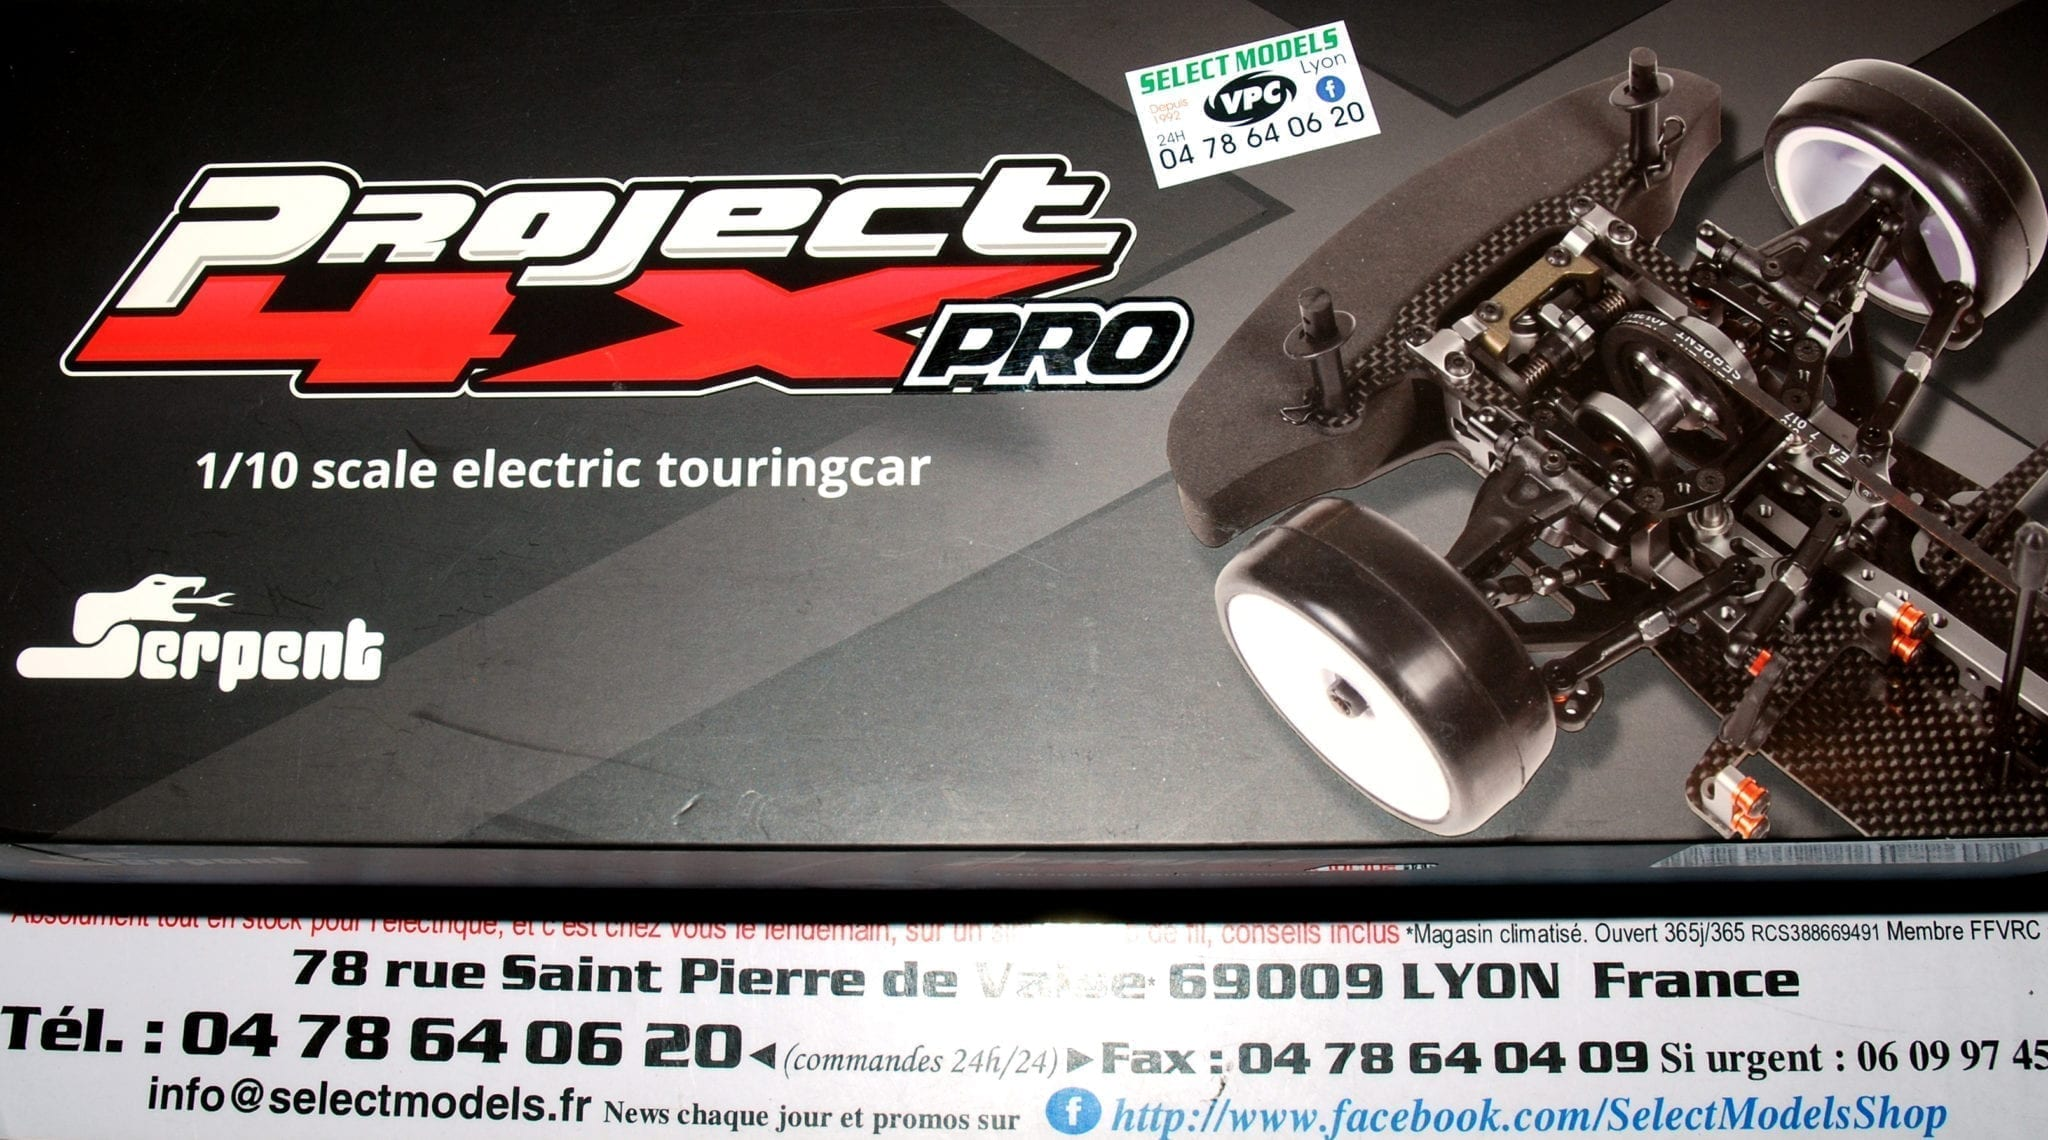 Project 4X pro Serpent 190mm